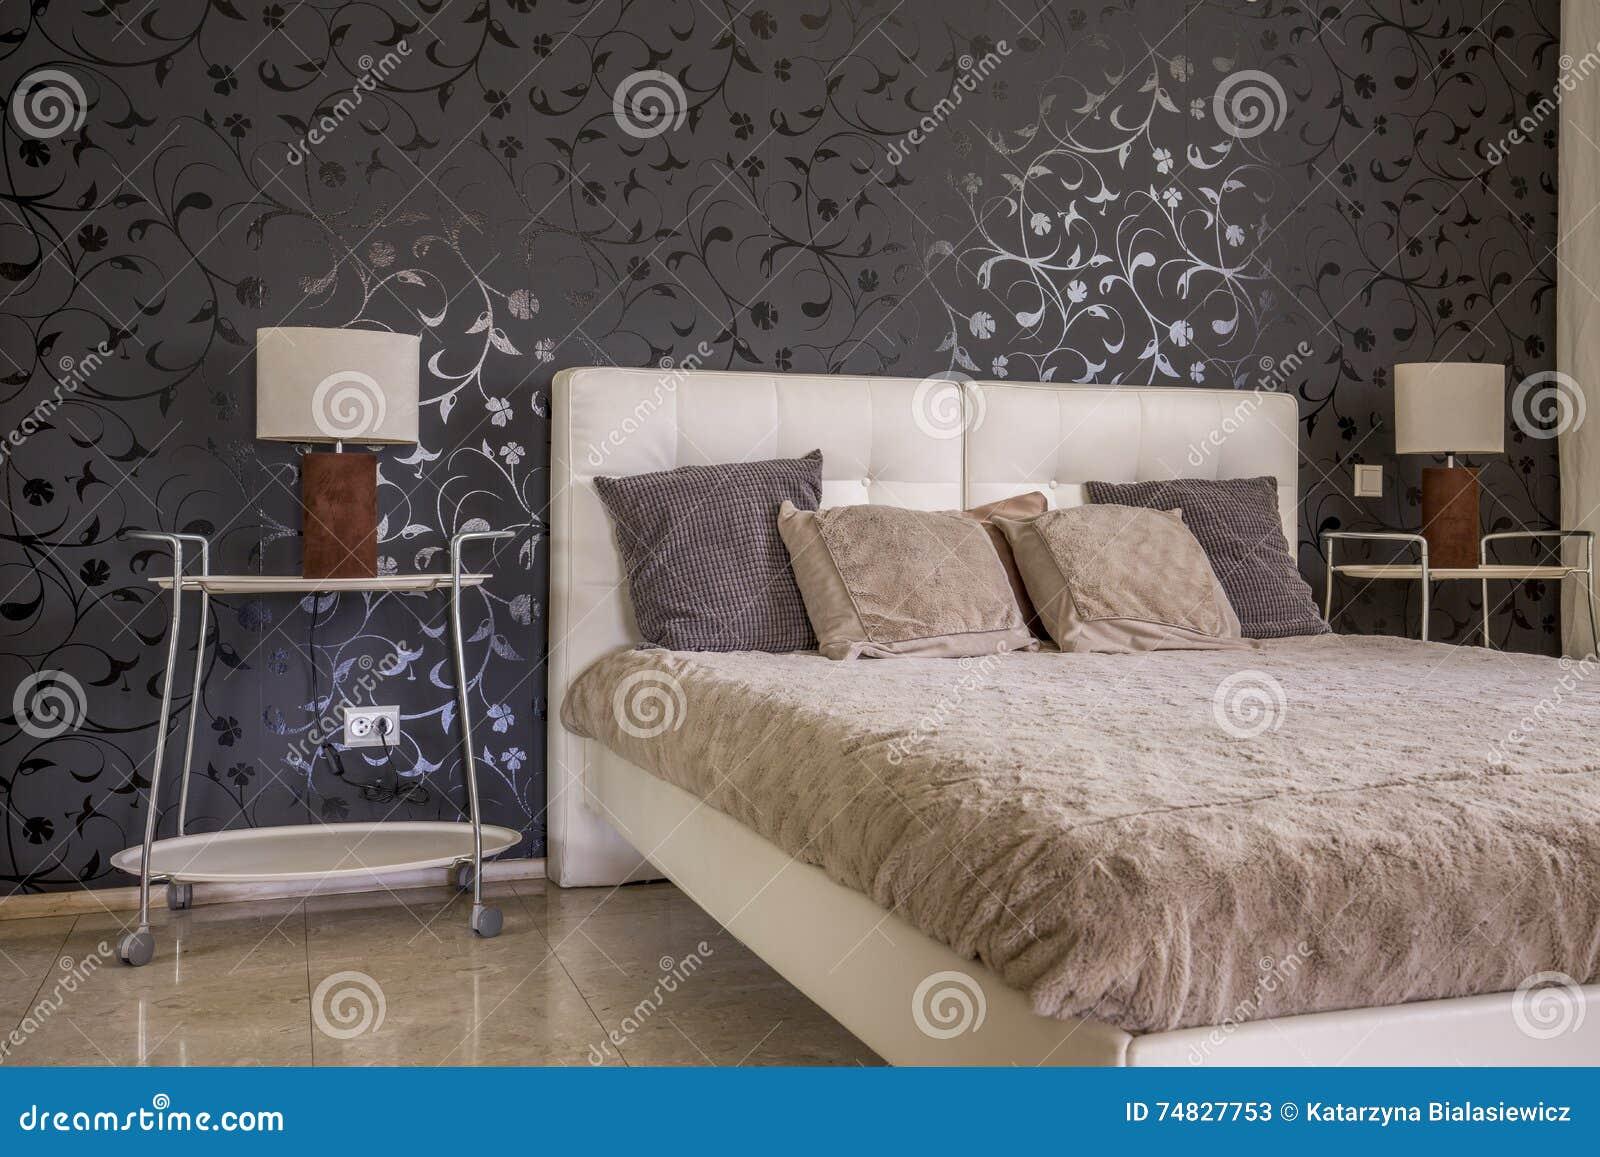 Discrete Elegance Of Dark Bedroom Decor Stock Image Image Of